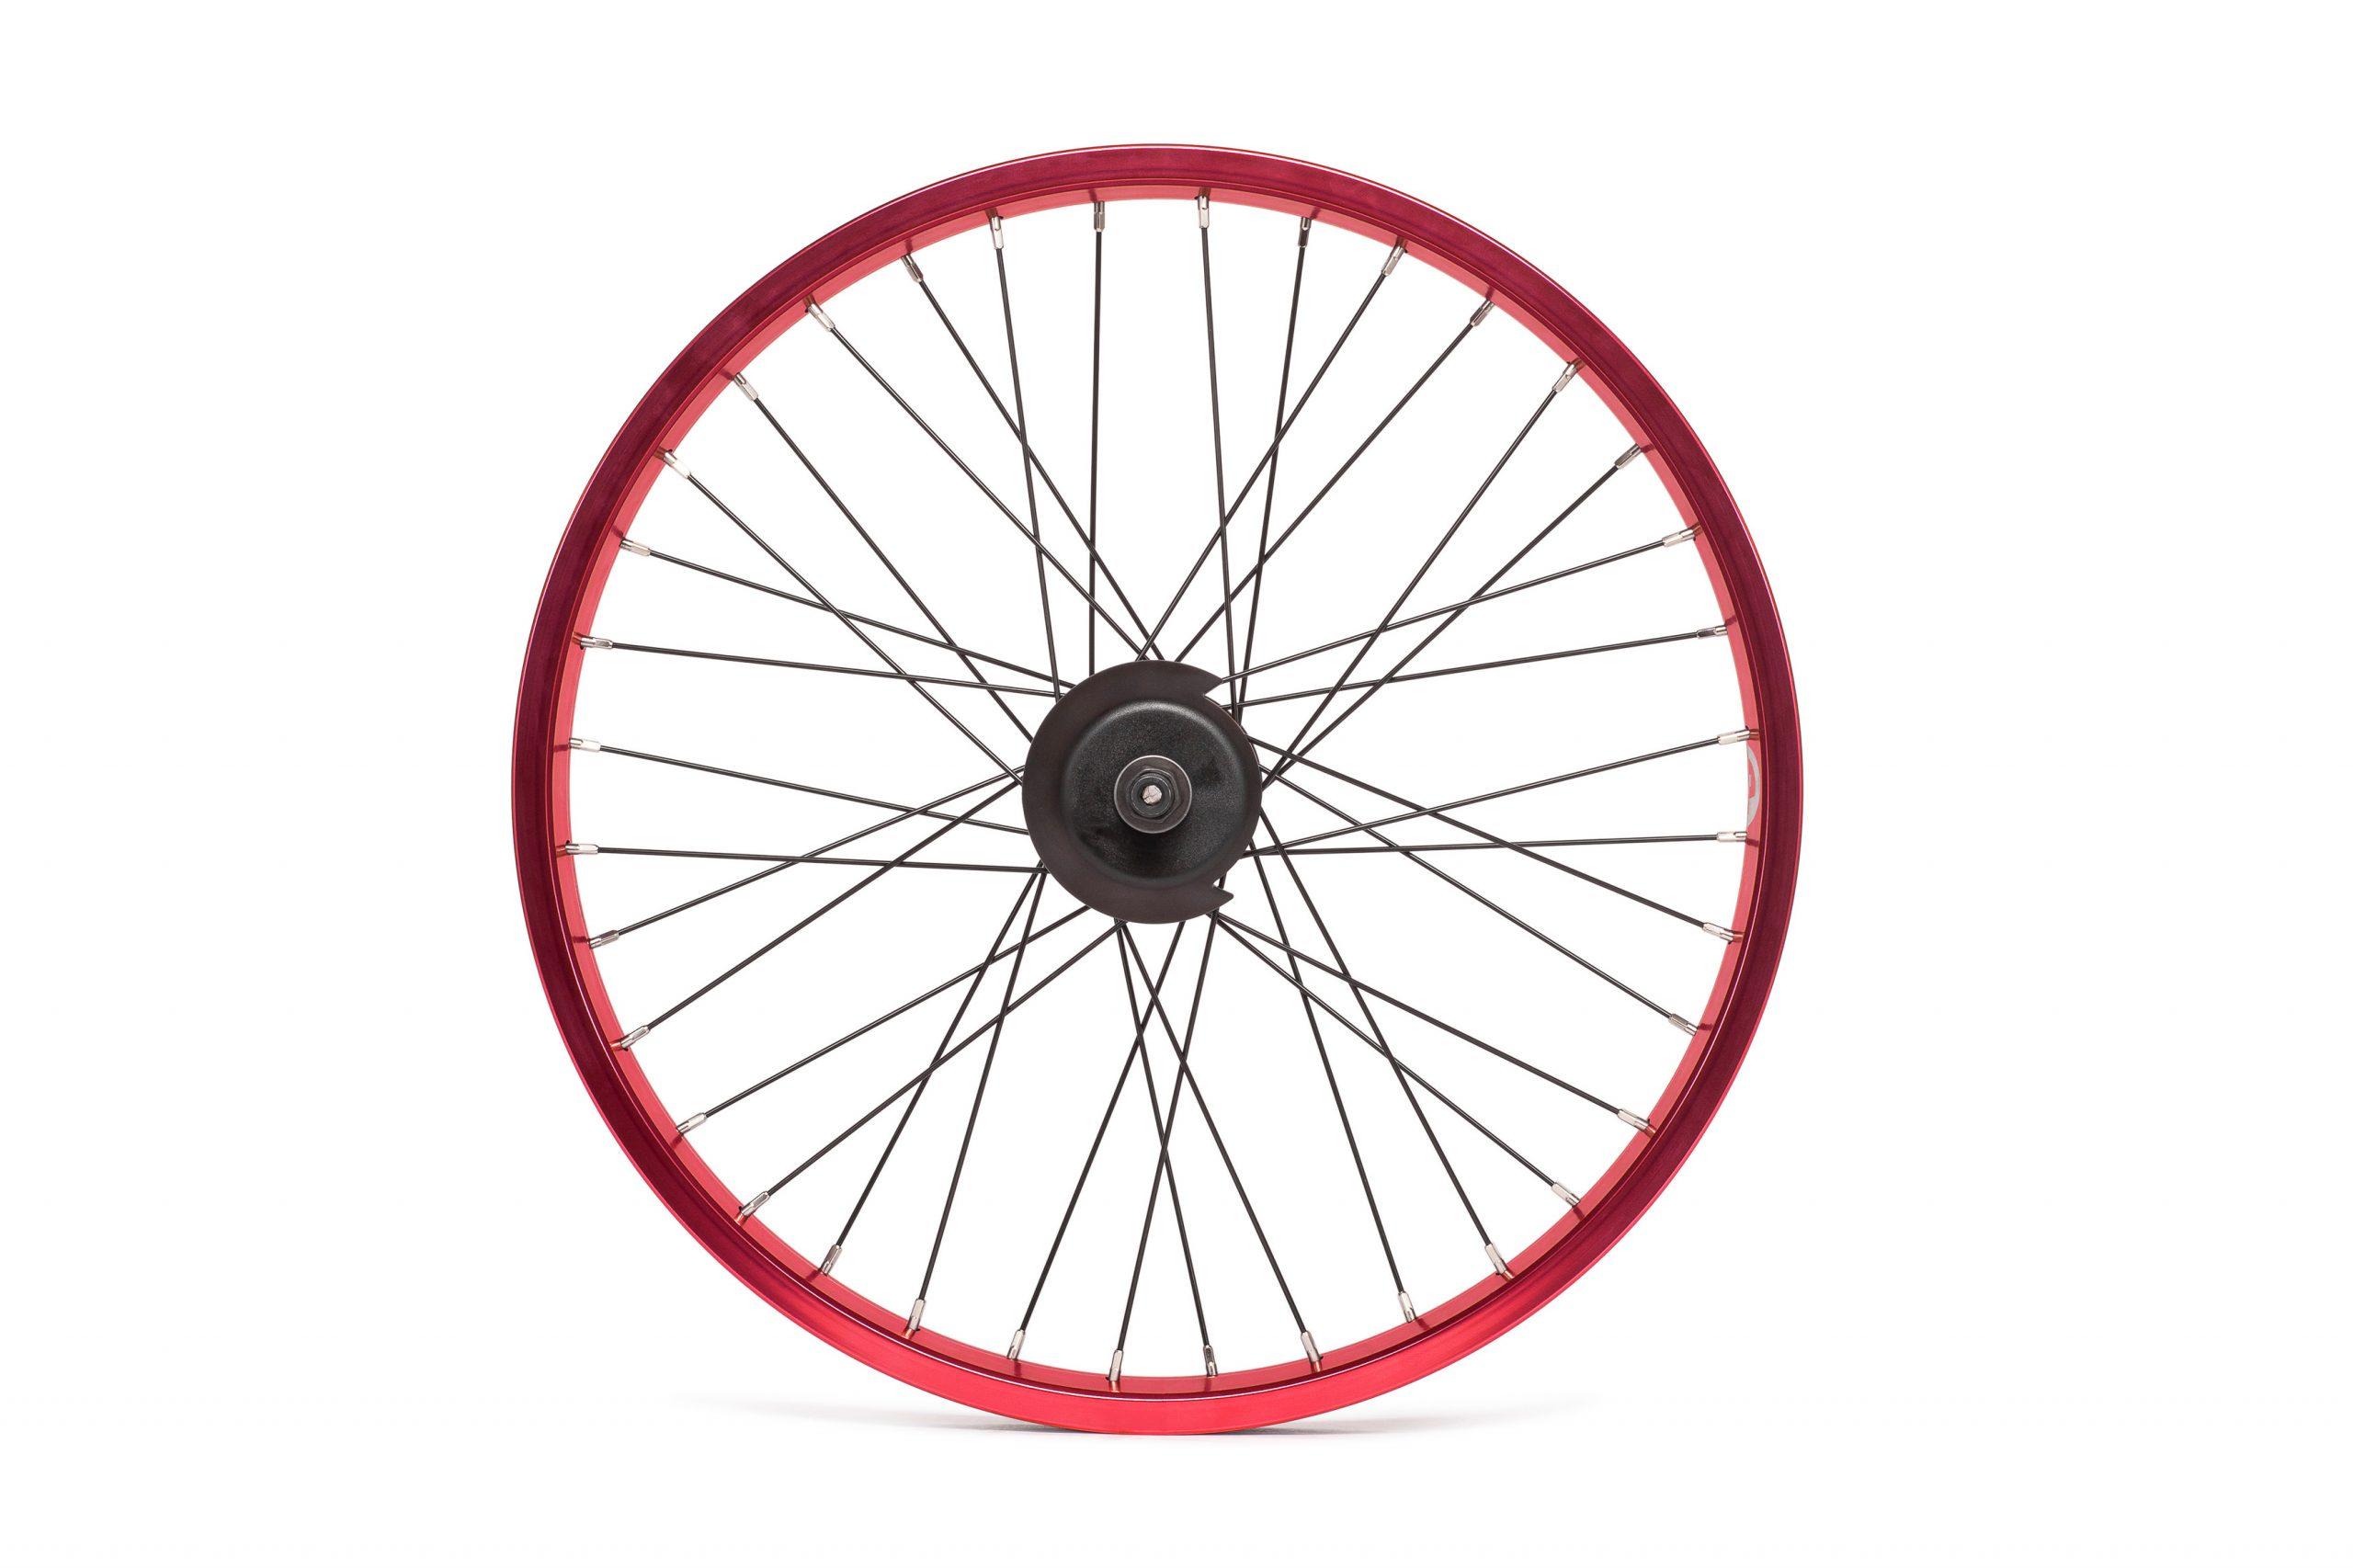 Salt_Everest_FC_rear_wheel_red_01